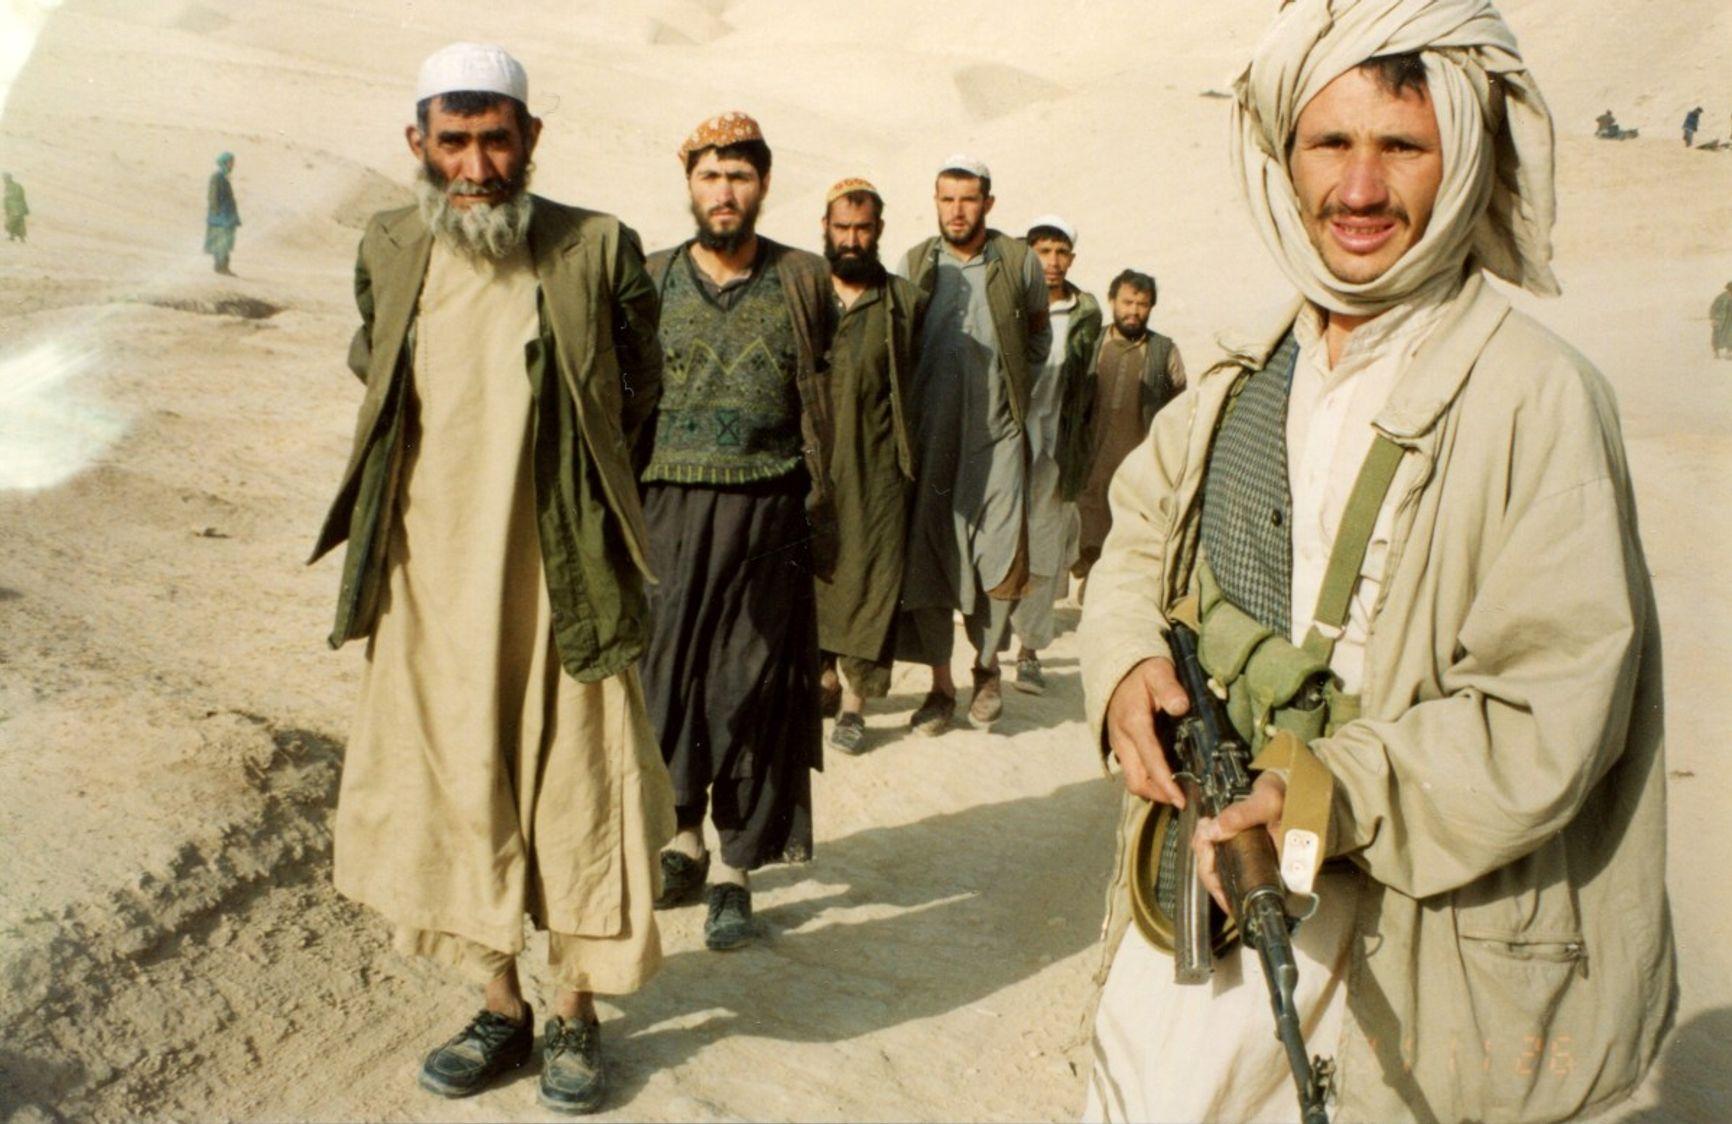 Кундуз, октябрь 2001. Дустумовцы берут в плен талибов